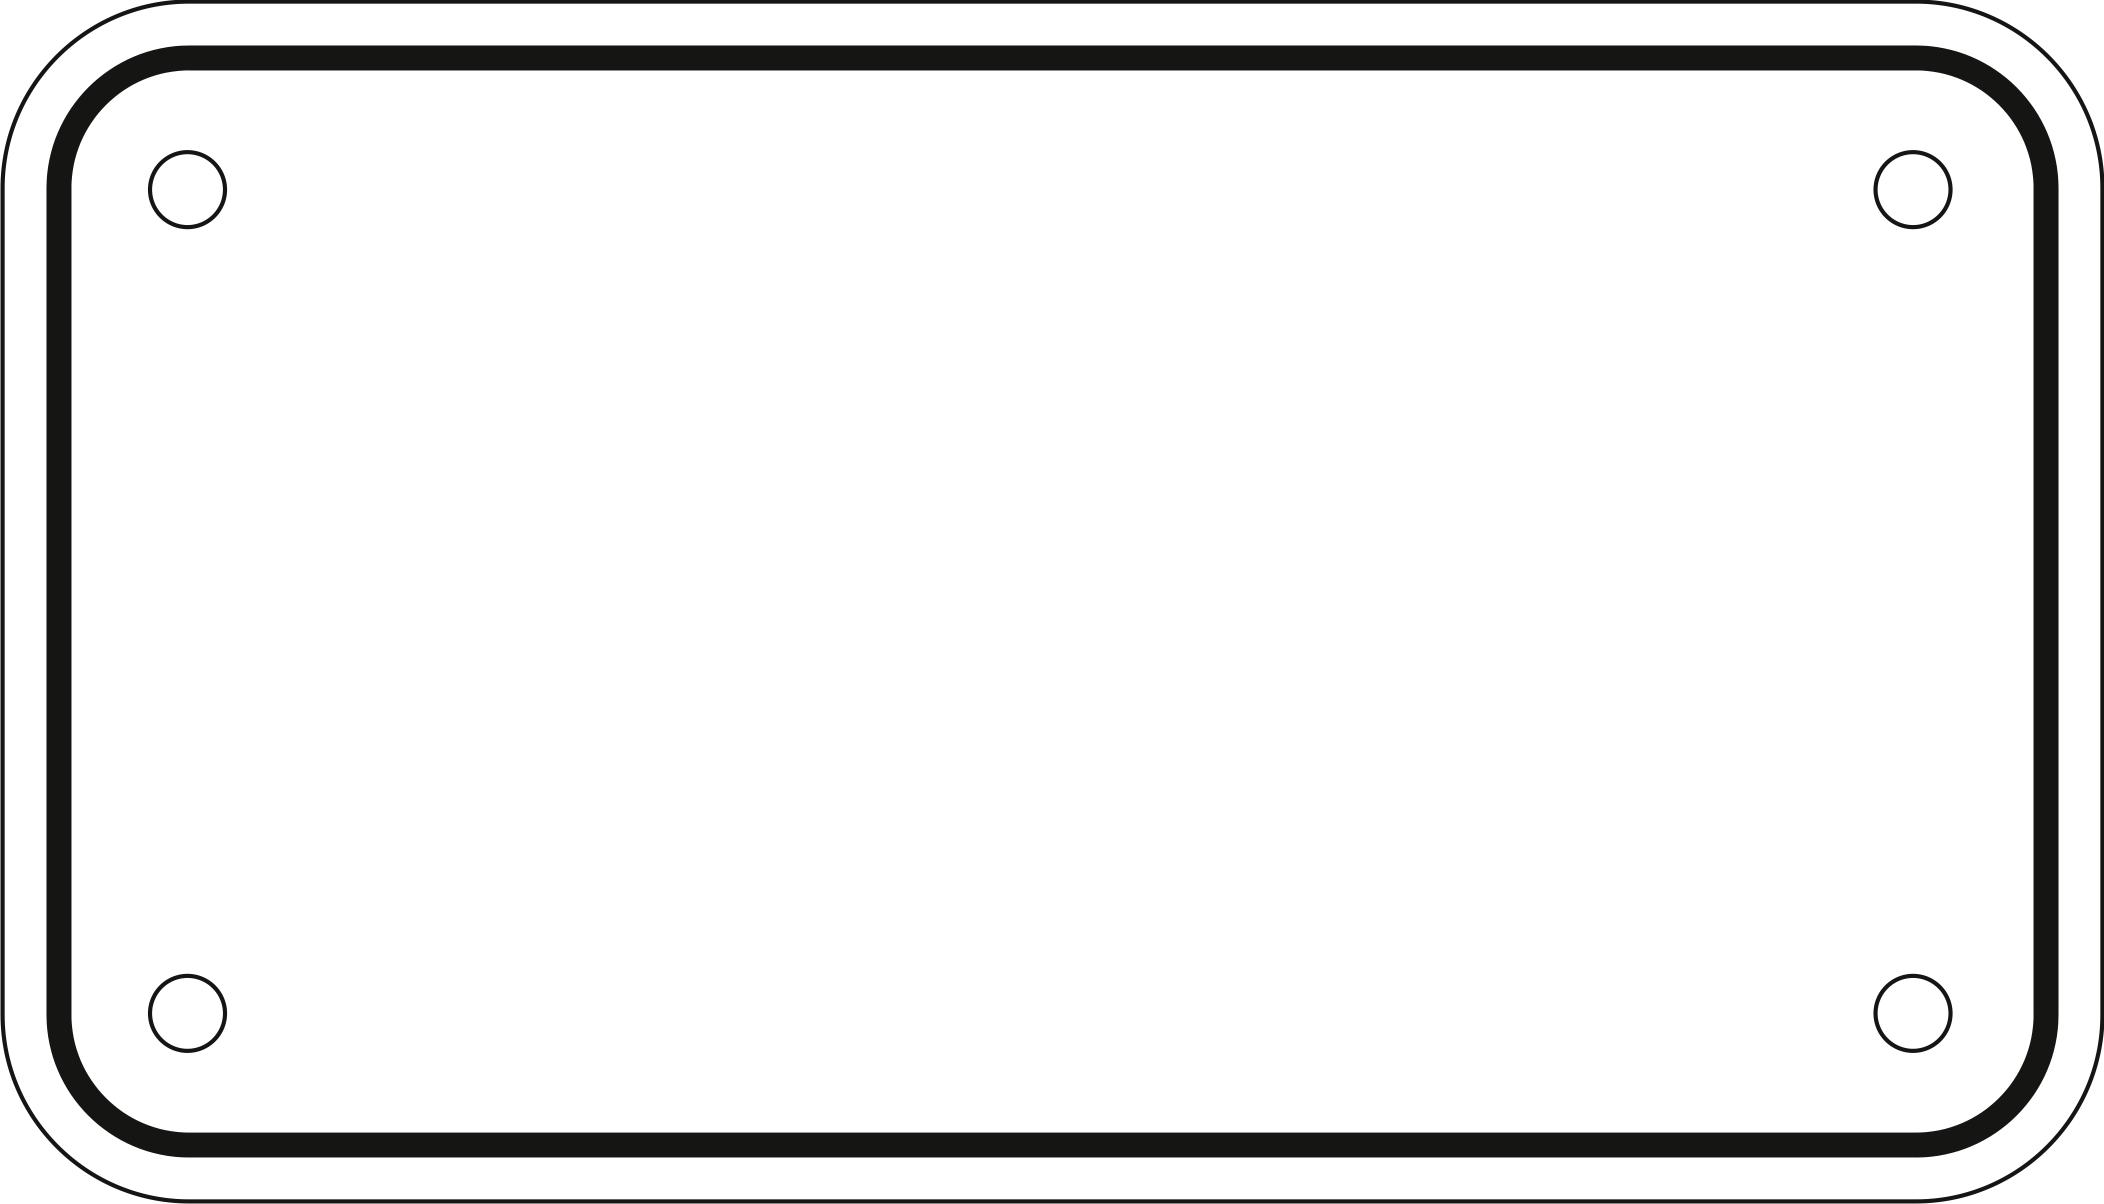 2104x1204 California License Plate Format